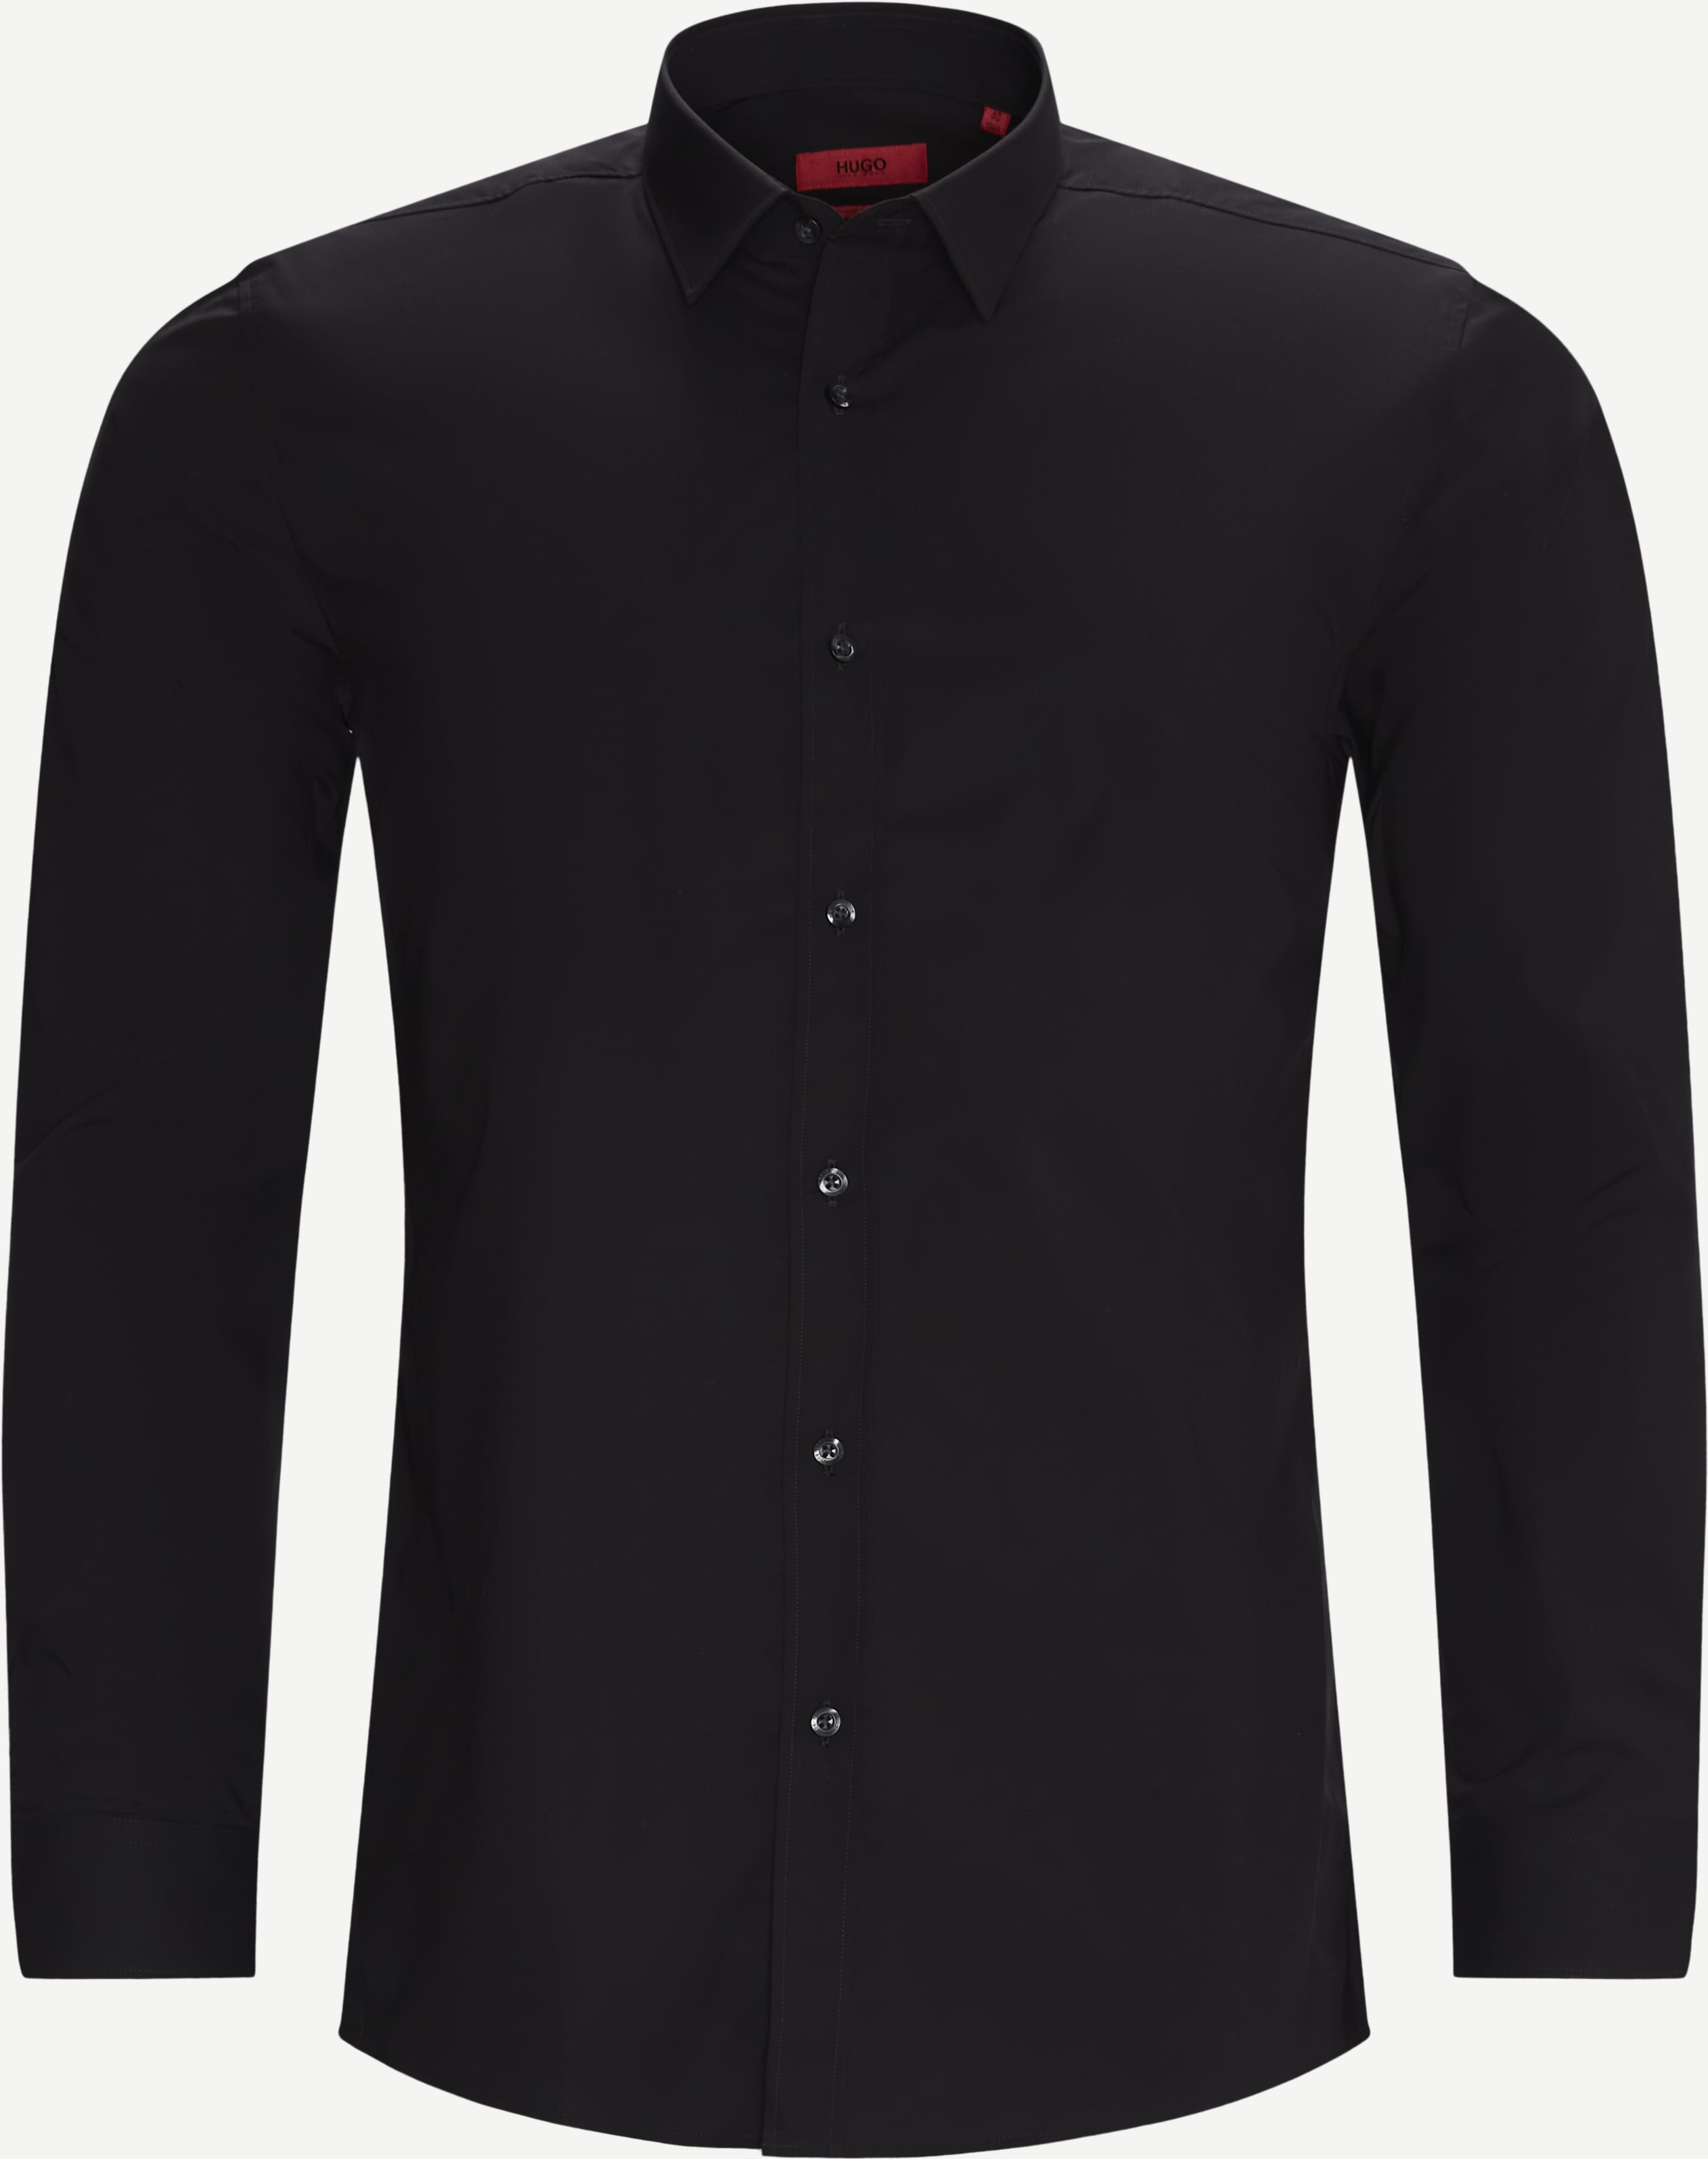 Hemden - Ekstra slim fit - Schwarz